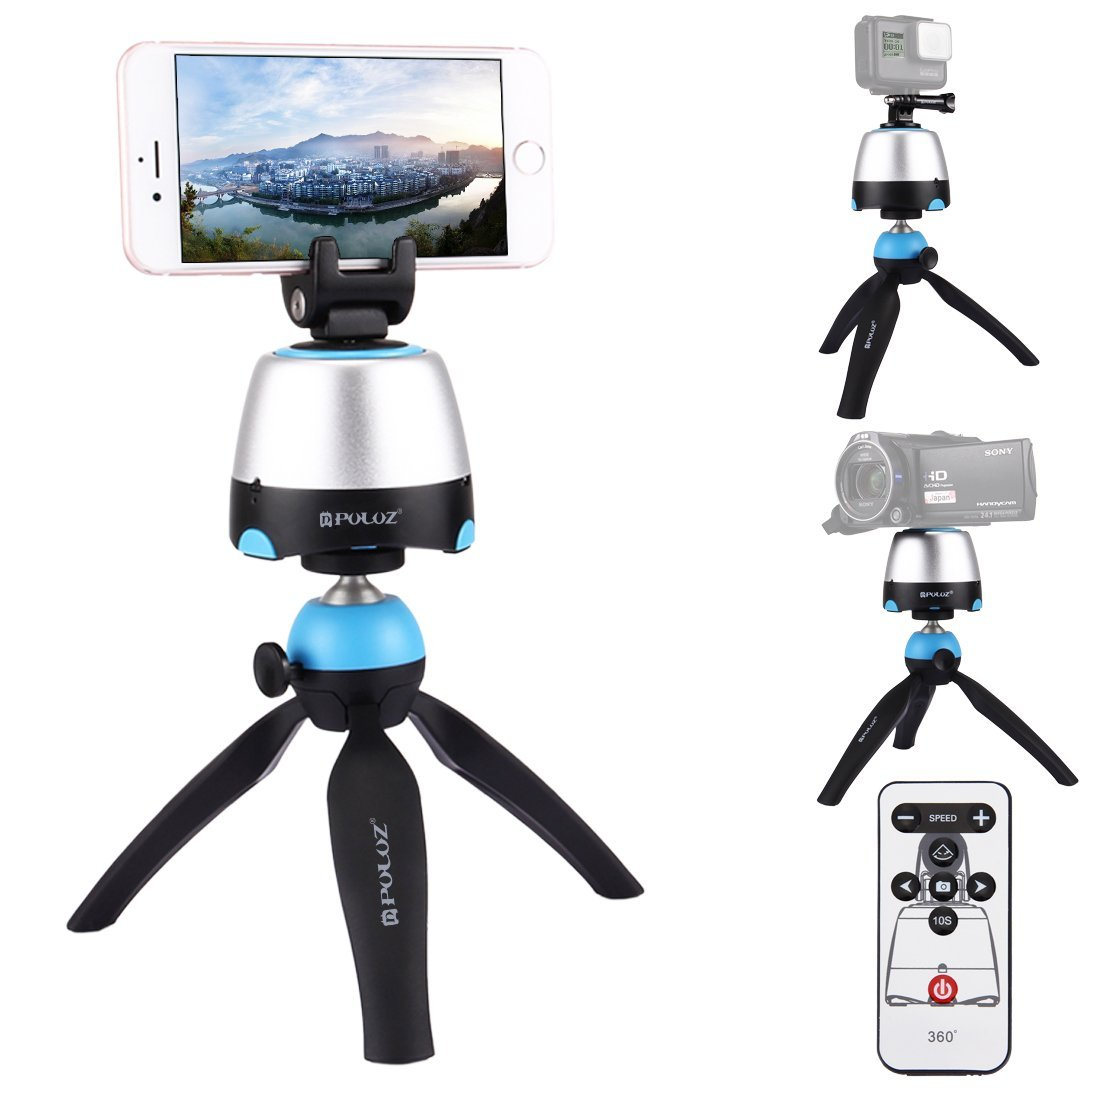 PULUZ Pocket Mini Tripod Mount with 360 Degree Ball Head for Smartphones, GoPro, DSLR Cameras (Blue)